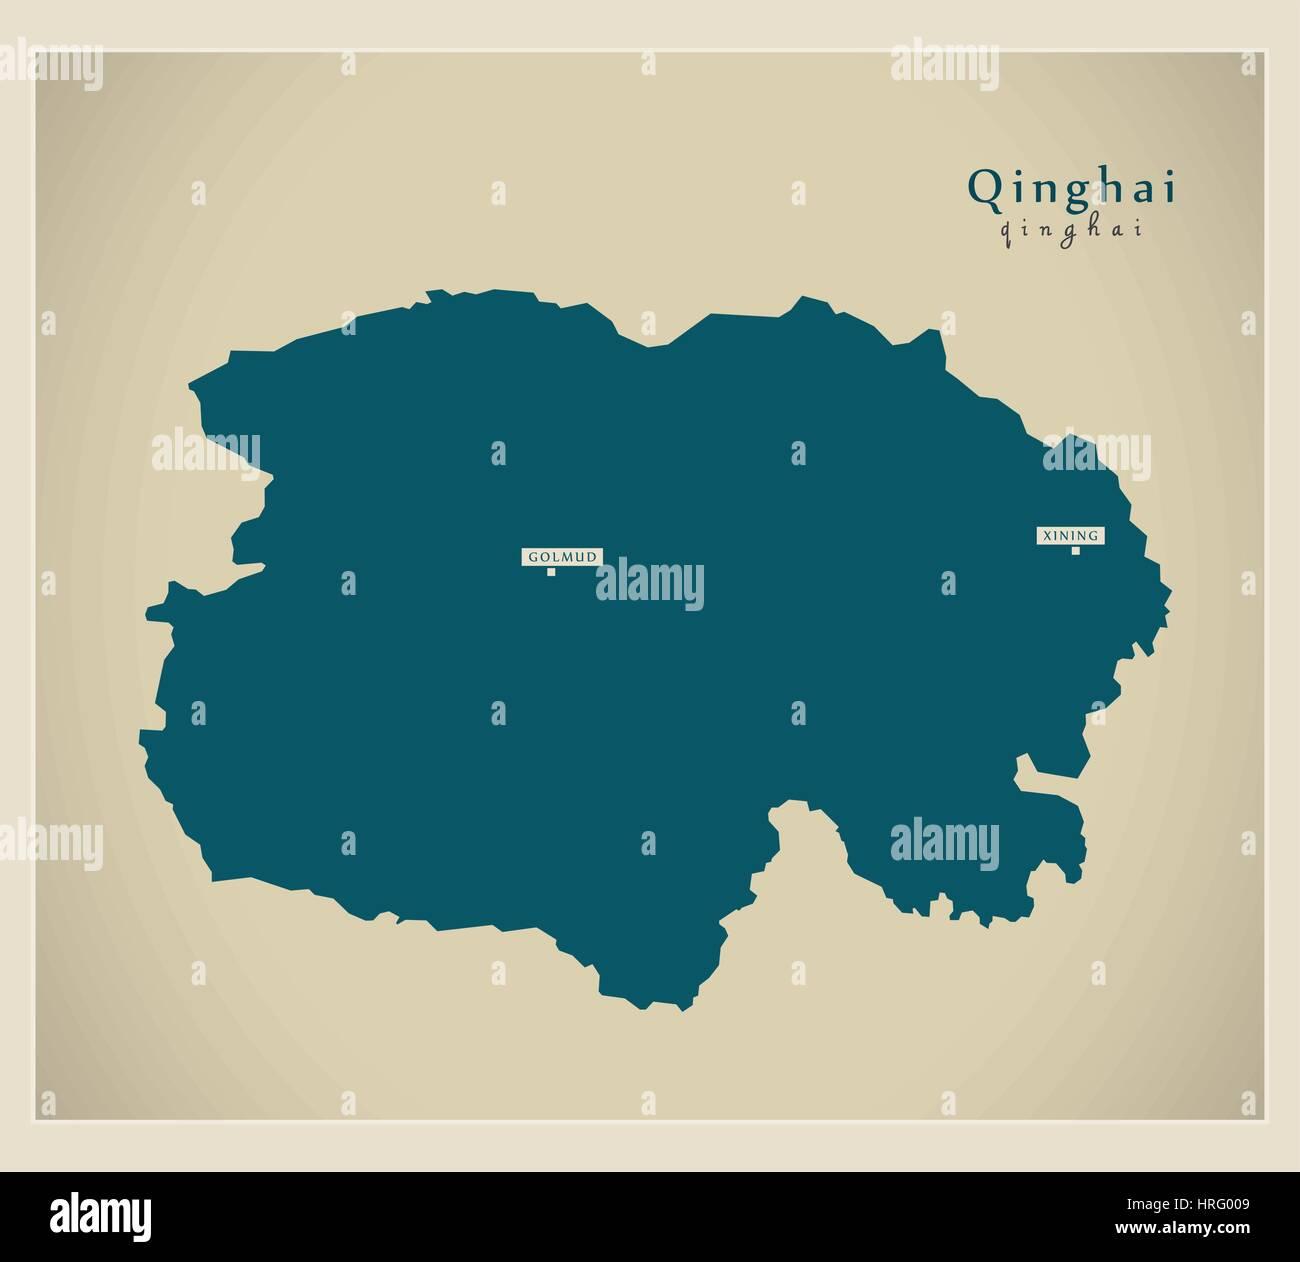 Modern Map - Qinghai - Stock Image